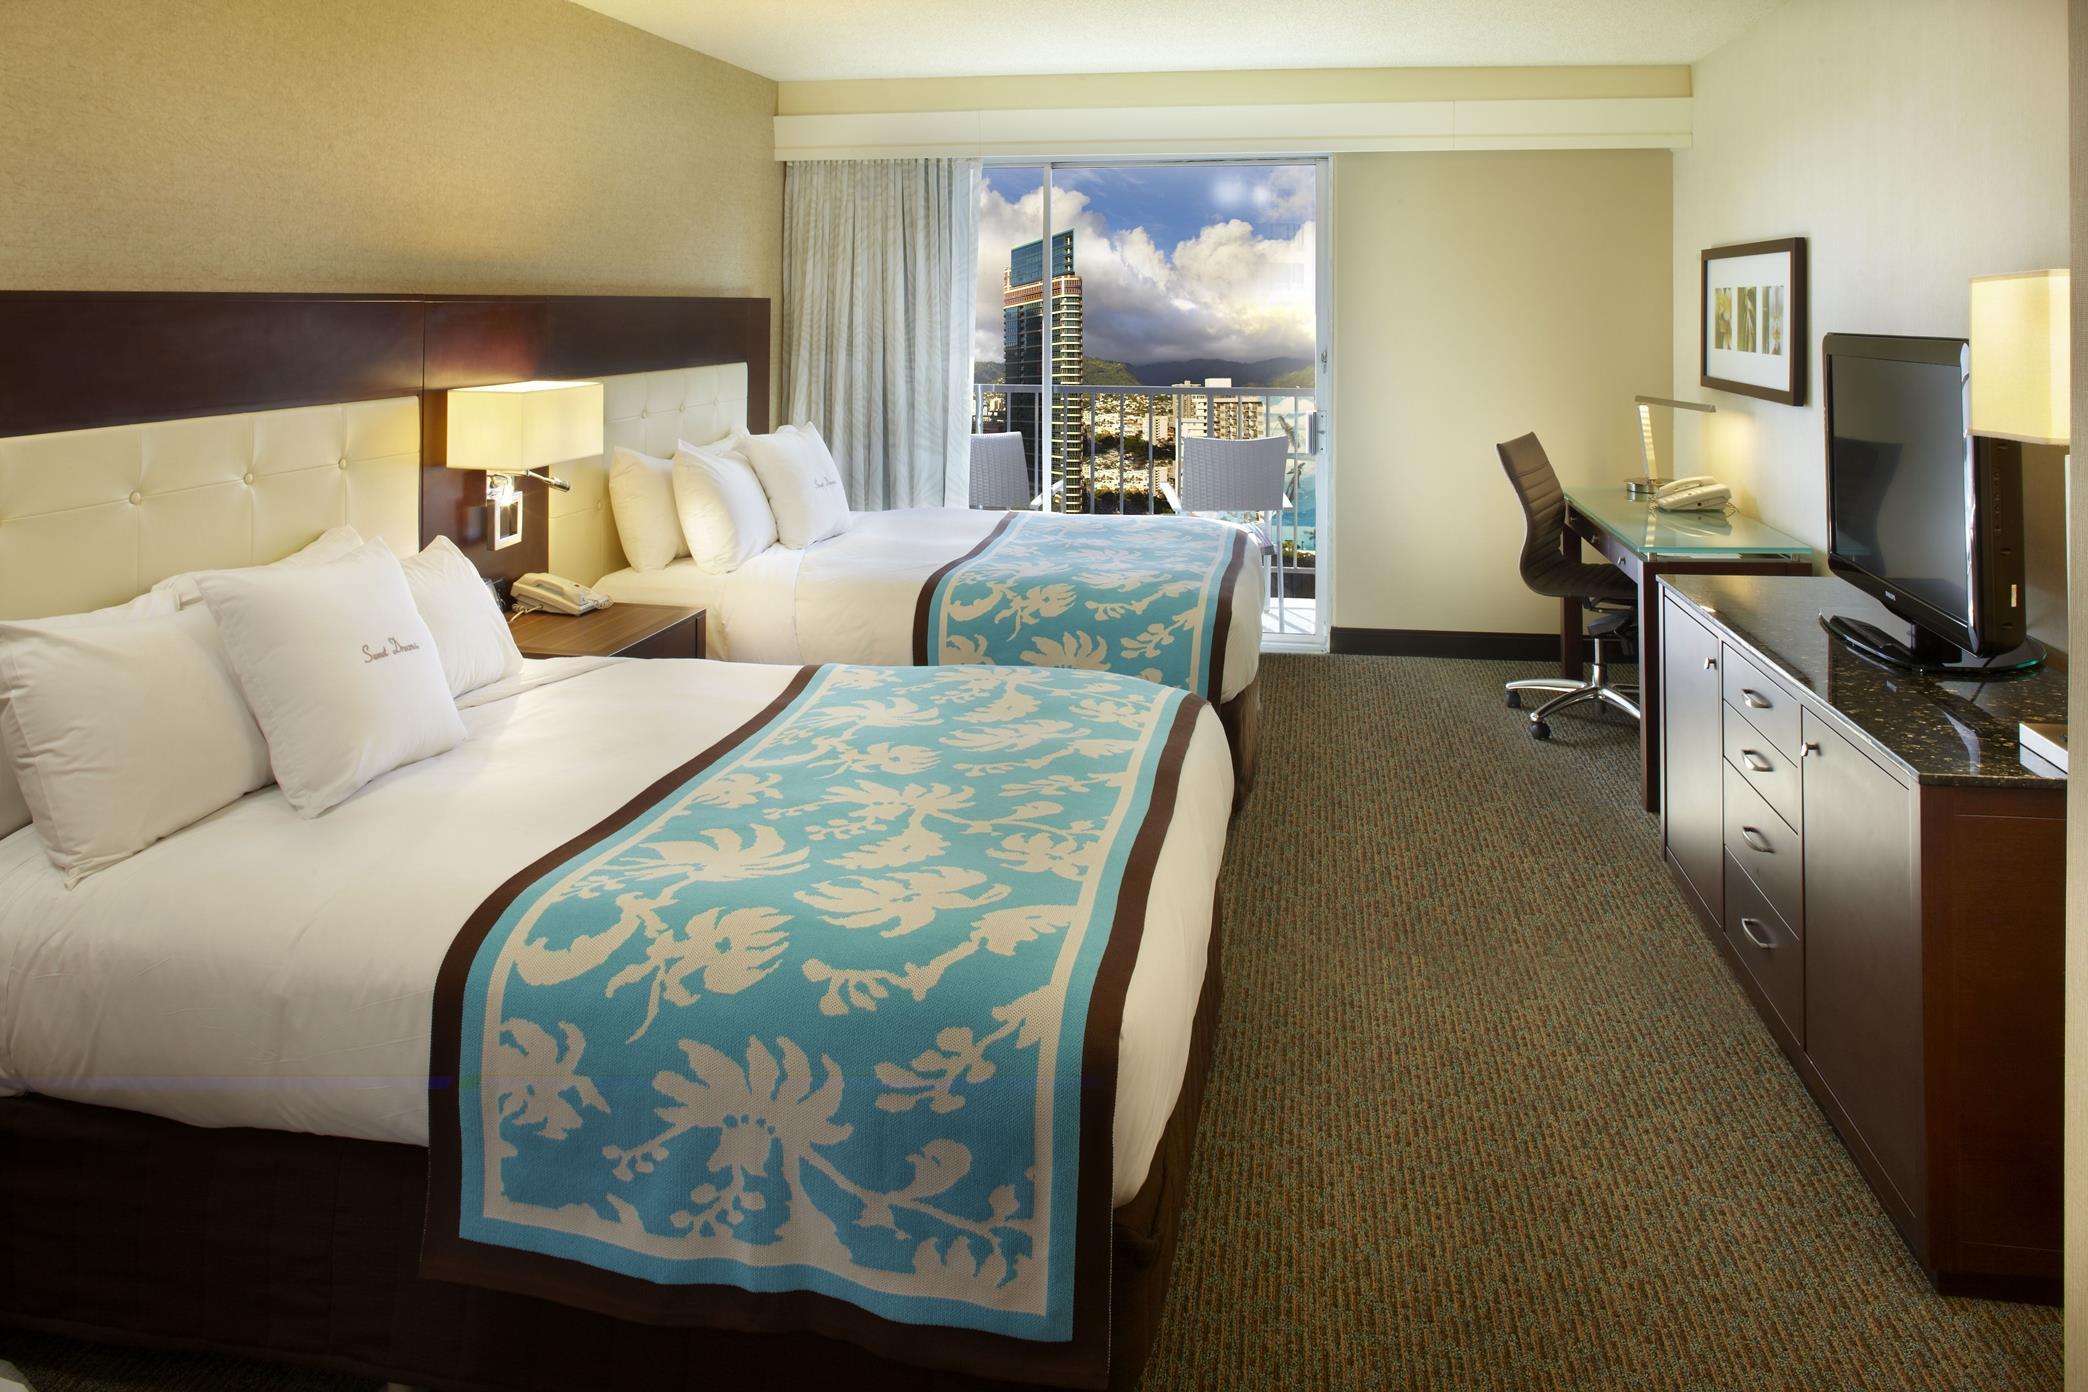 DoubleTree by Hilton Hotel Alana - Waikiki Beach image 14